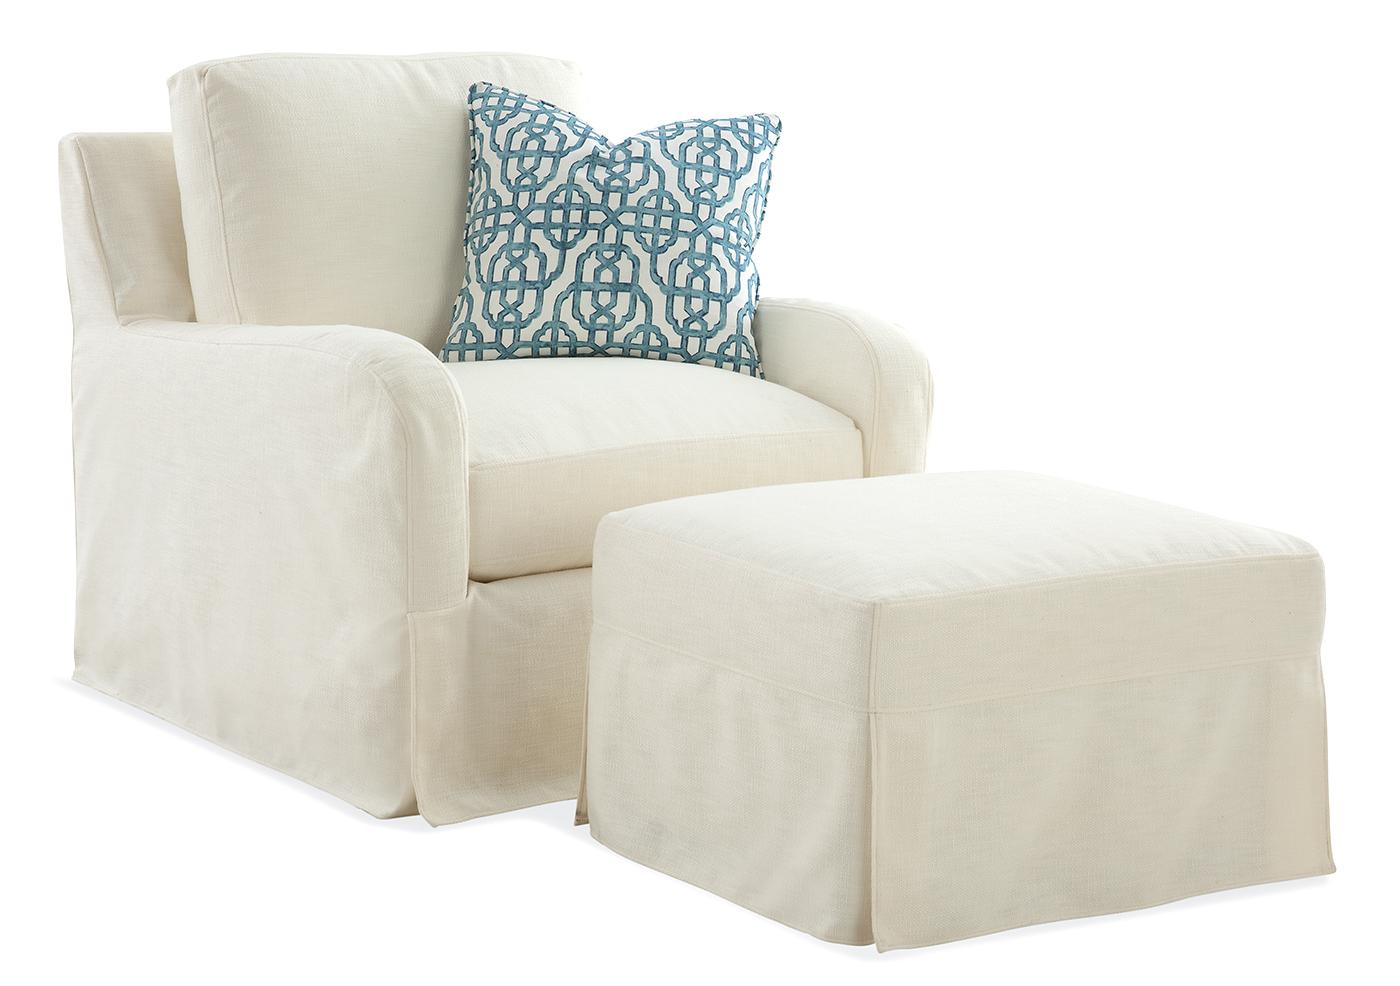 Halsey Chair/Ottoman Slipcovered